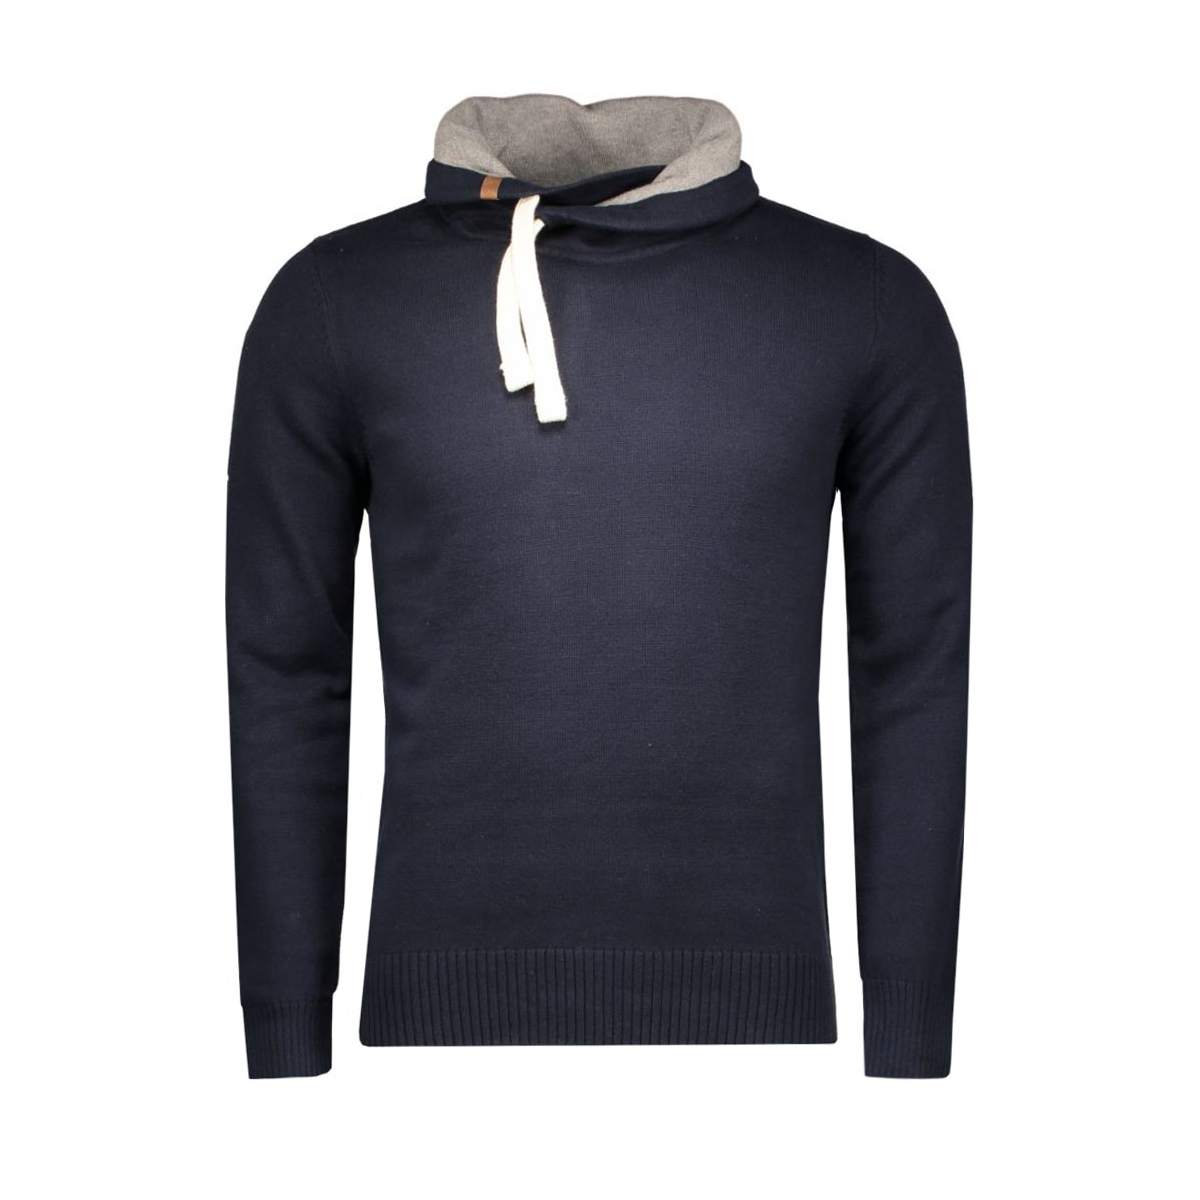 3021325.09.10 tom tailor sweater 6800